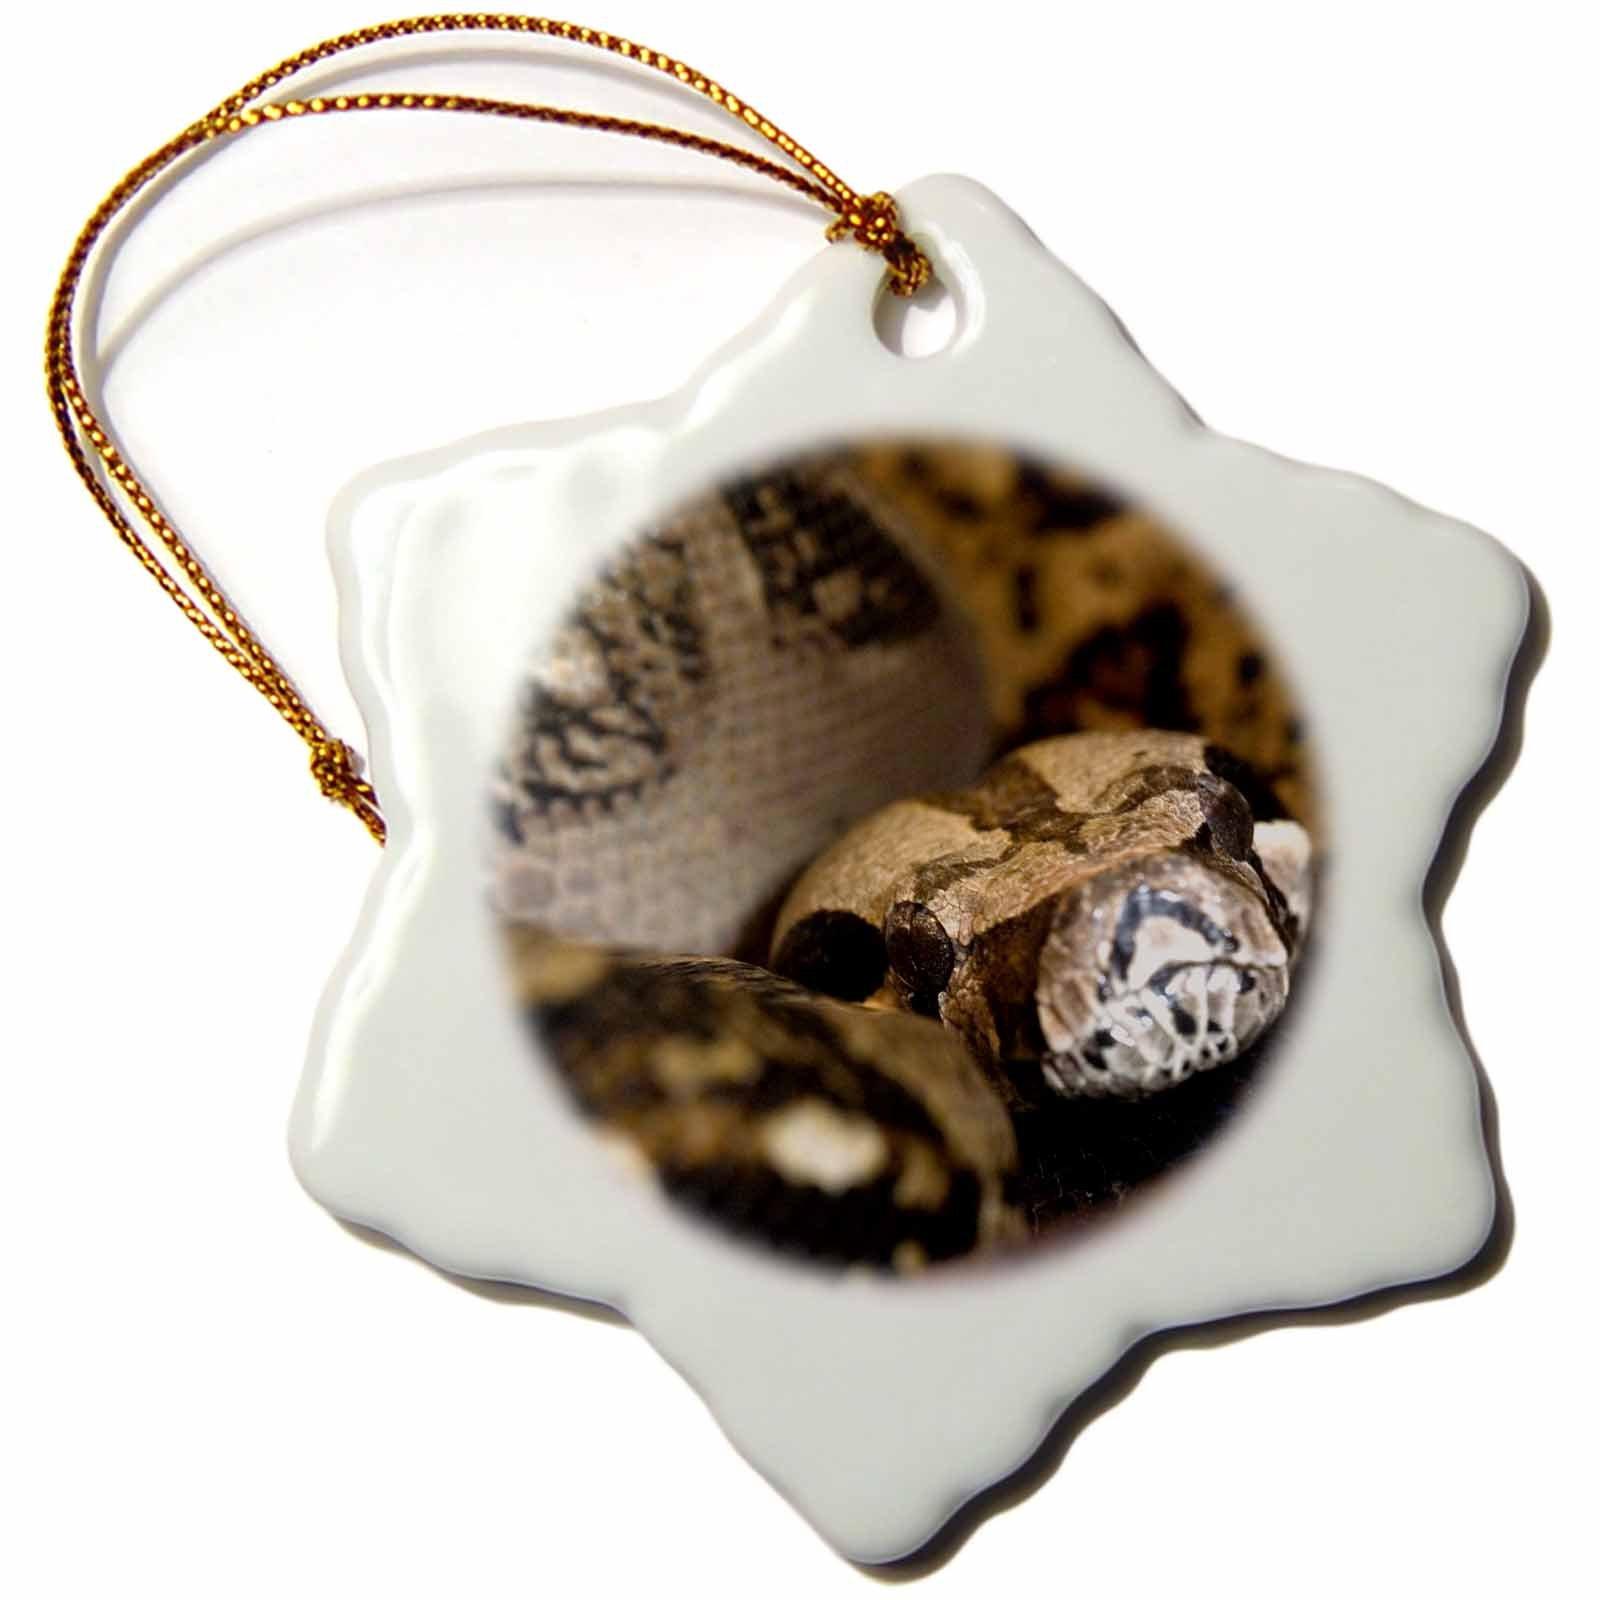 3dRose orn_83712_1 Boa constrictor Snake NA02 CZI0002 Christian Ziegler Snowflake Porcelain Ornament, 3-Inch